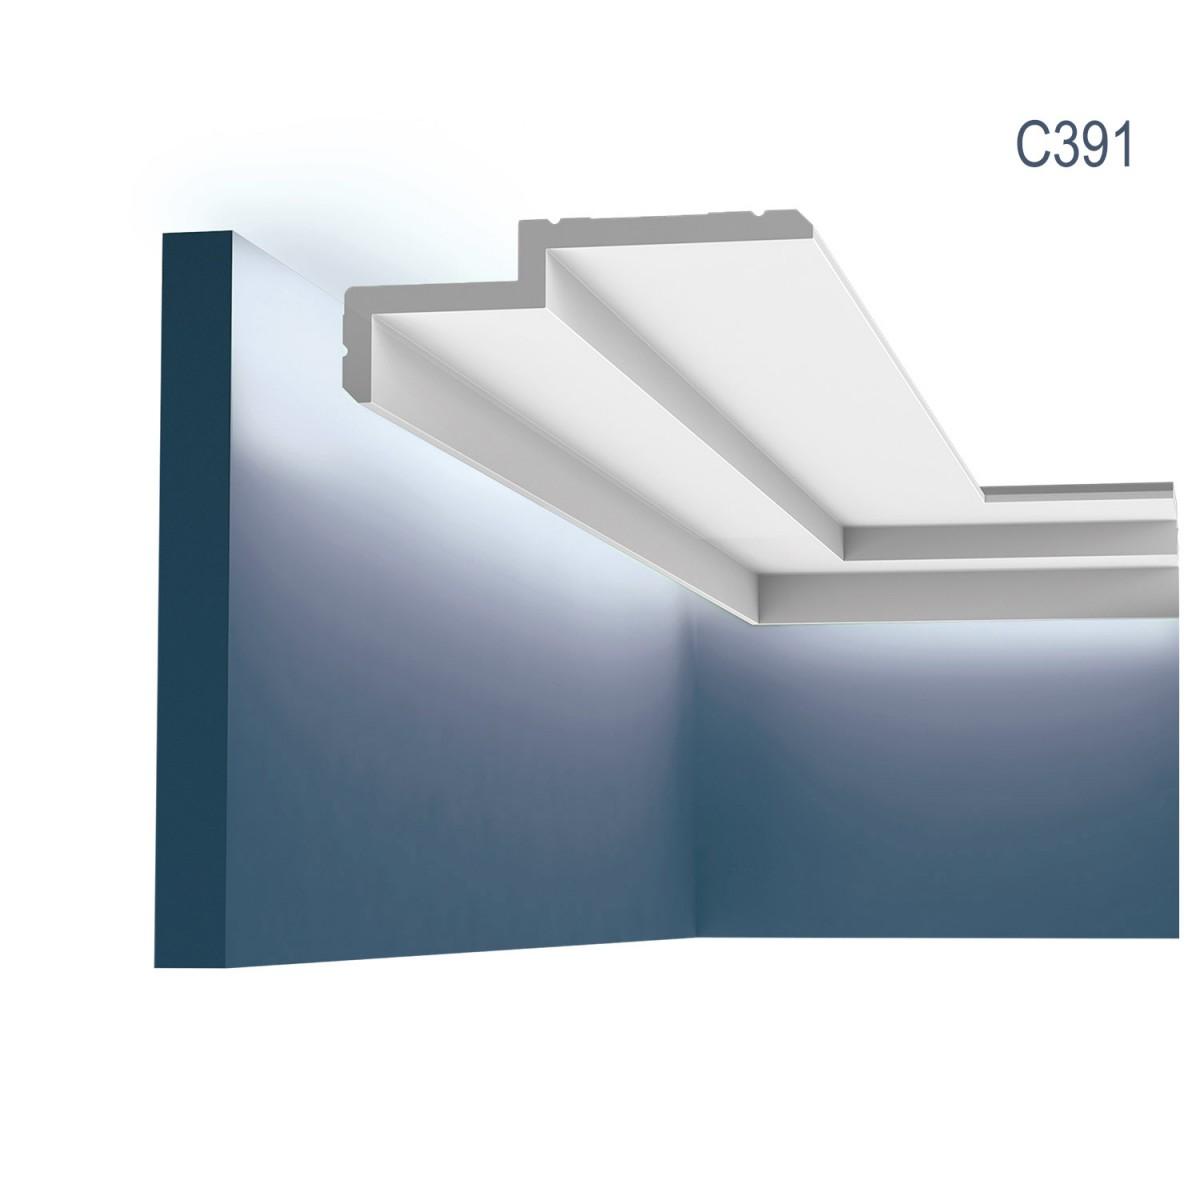 Cornisa Modern C391, Dimensiuni: 200 X 6 X 16 cm, Orac Decor